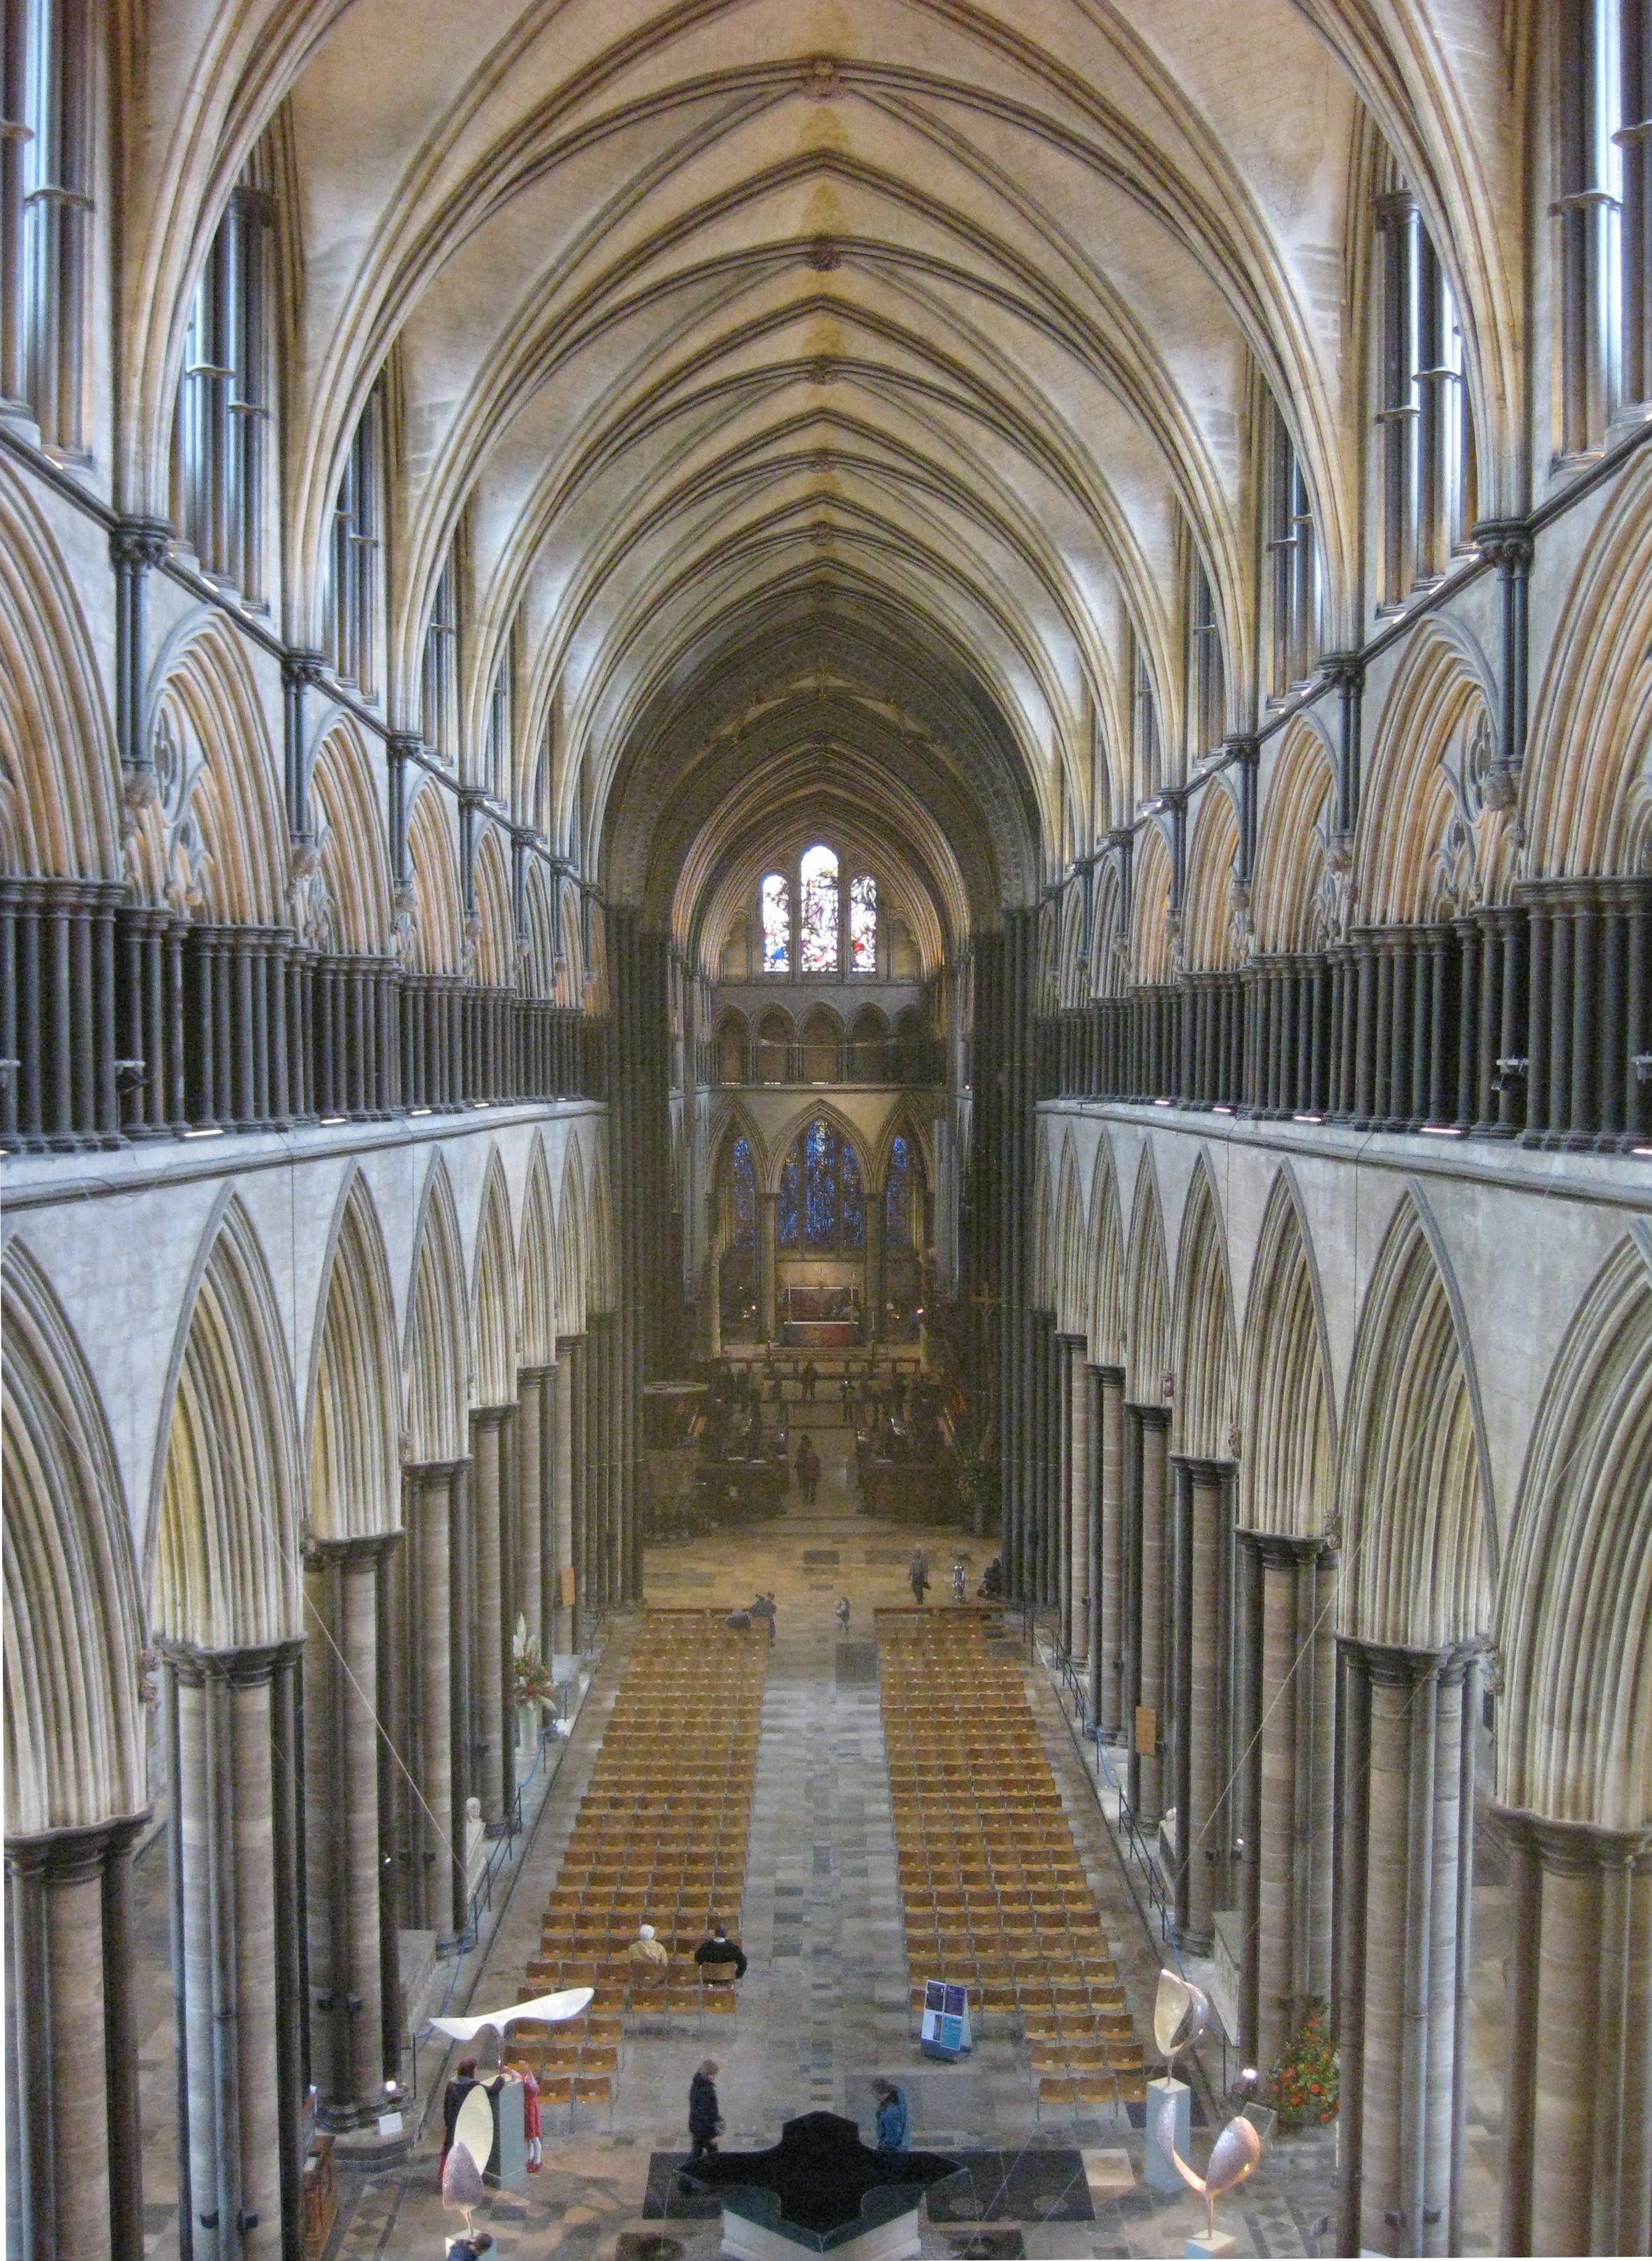 salisbury cathedral - photo #32